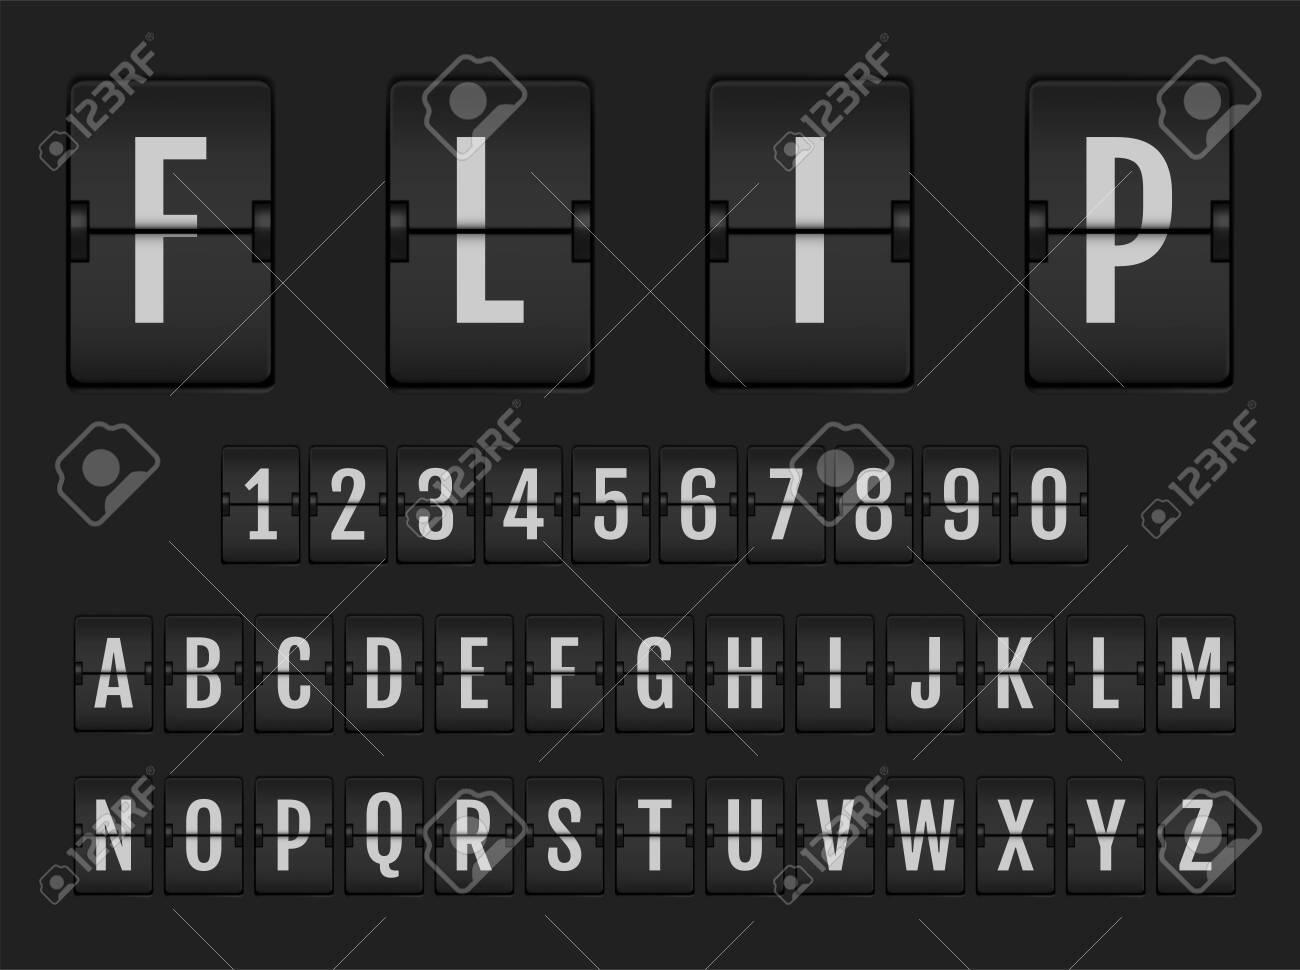 Flip countdown digital calendar clock numbers and letters. Vector alphabet, font, airport board arrival symbols. - 125998286